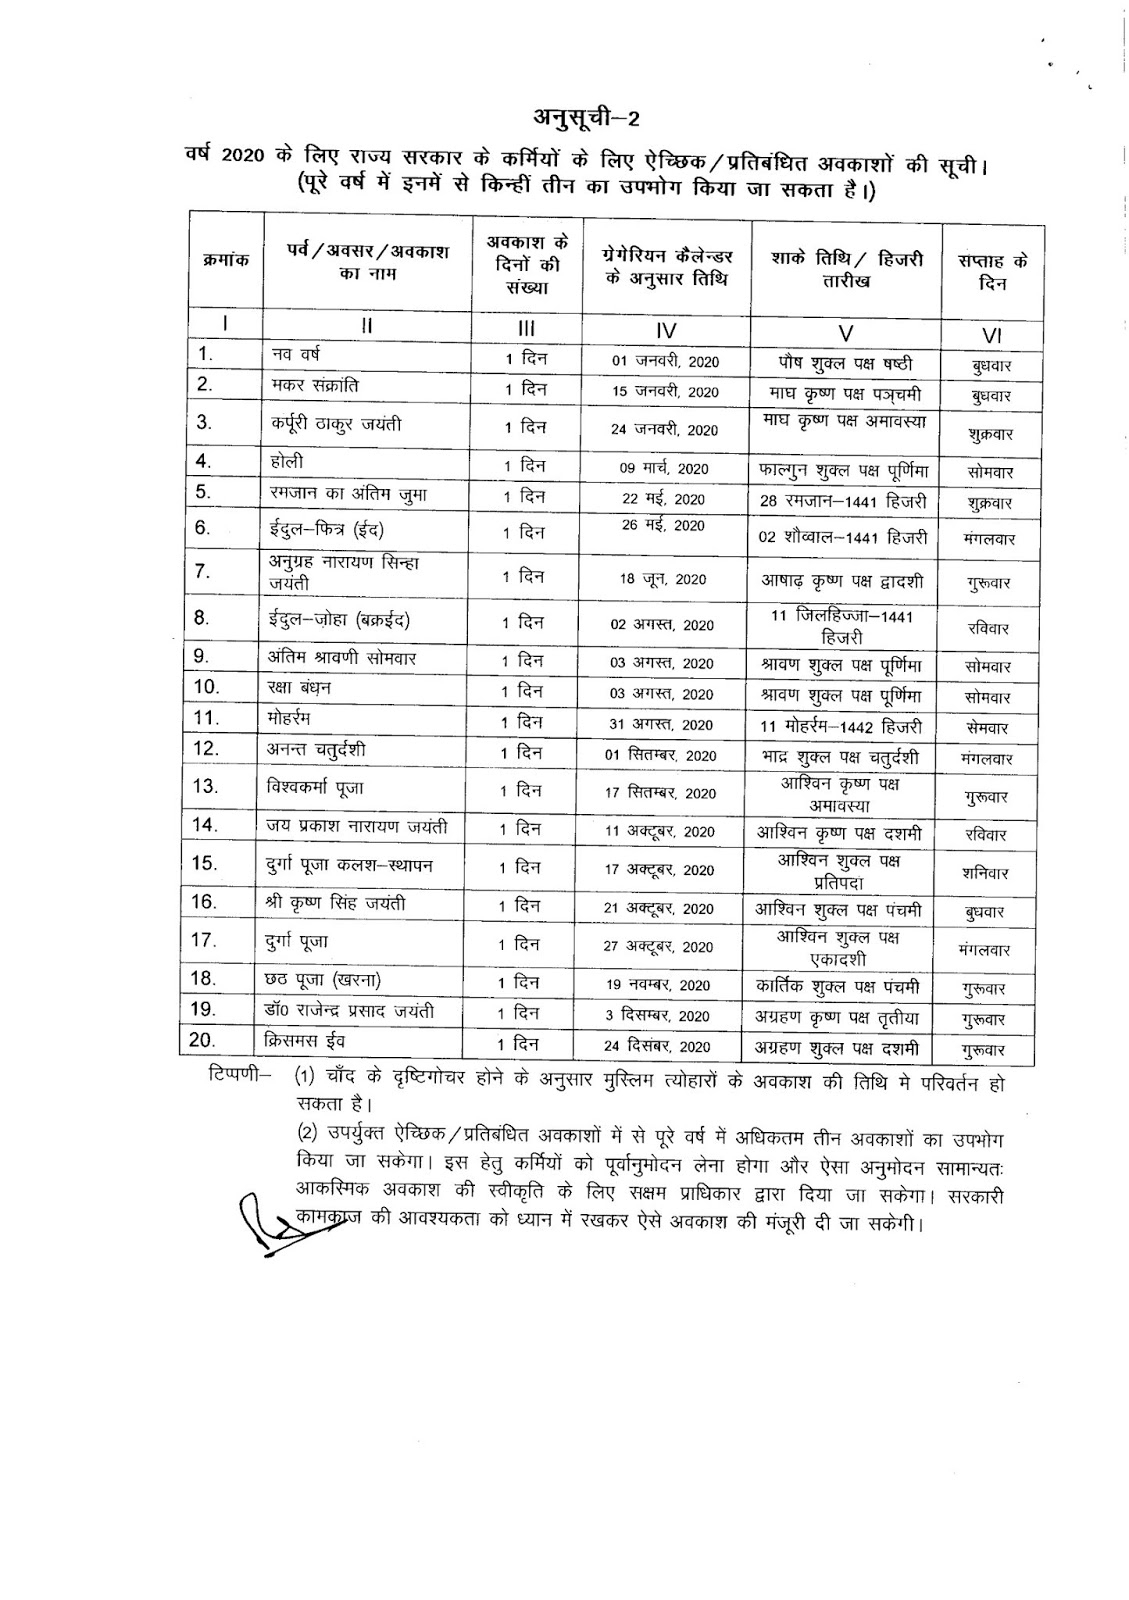 Download Bihar Sarkar Calendar 2020 | Calendar For Planning intended for Bihar Sarkar Holiday Calendar